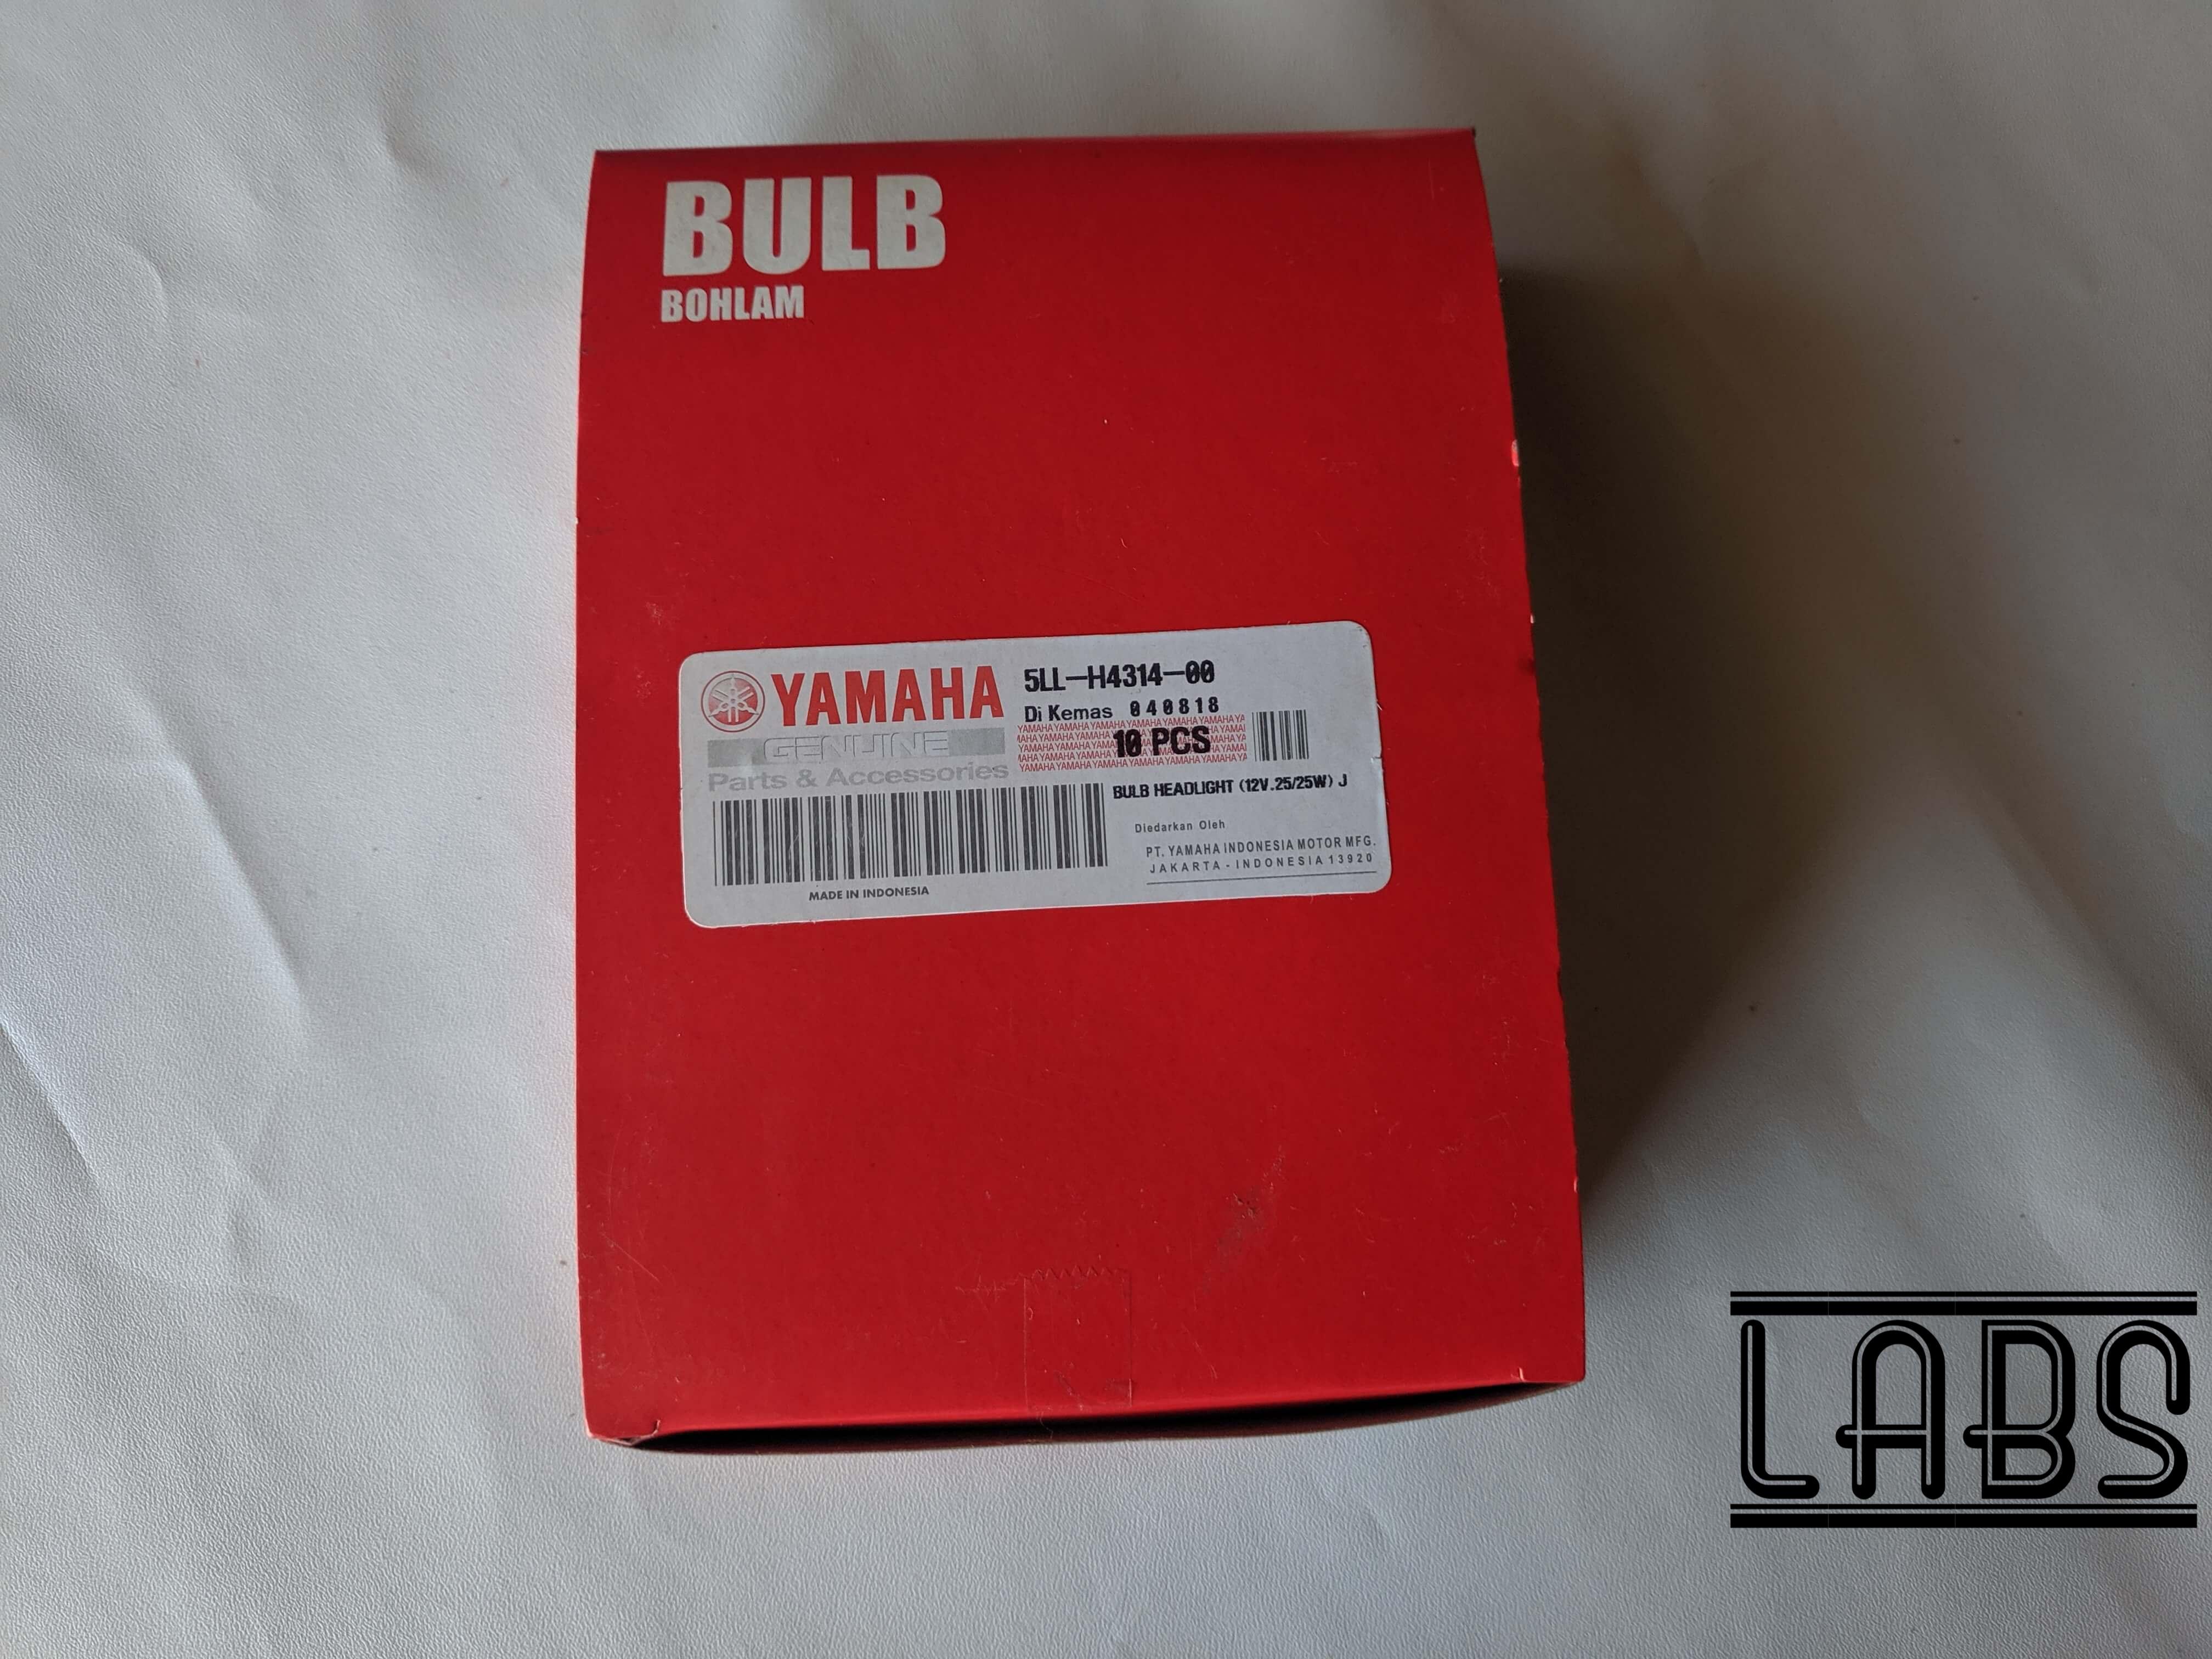 [Grosir]Bohlam Depan Lampu Yamaha Mio 12V 25Watt LED Sorot Tembak Motor 5LL 10 pcs